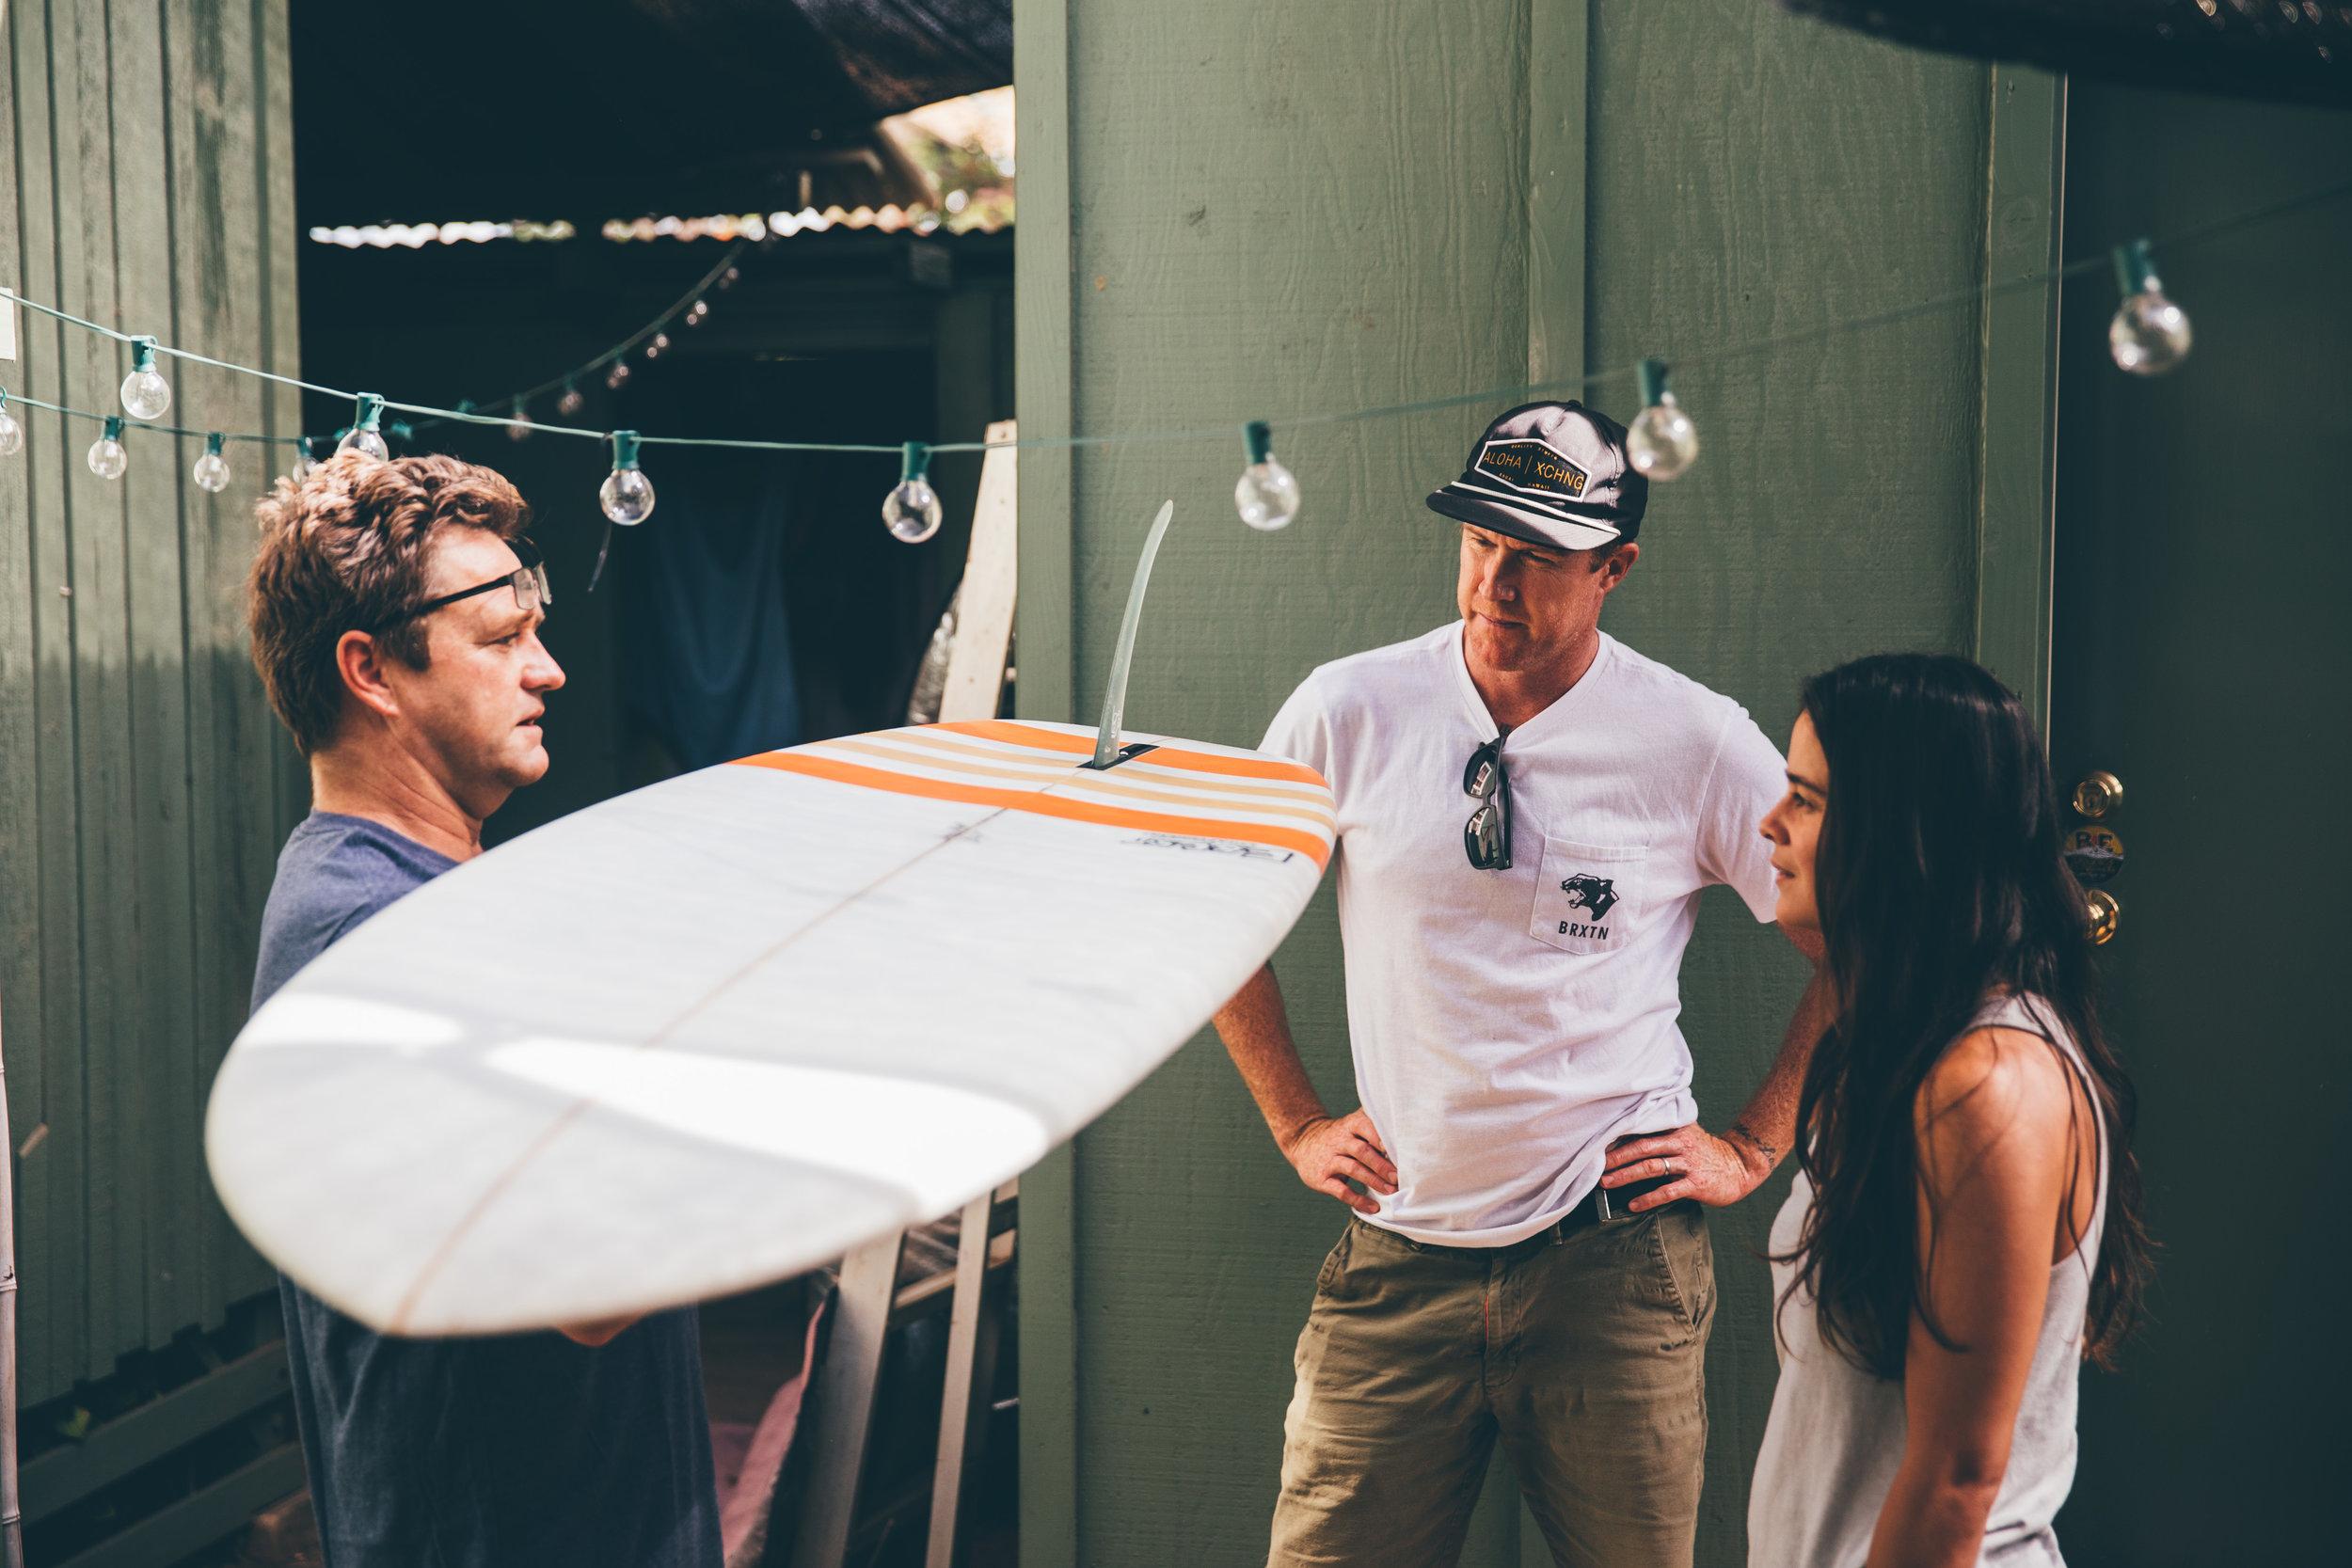 bryce johnson-photography-ebert surfboards-kauai-10.jpg